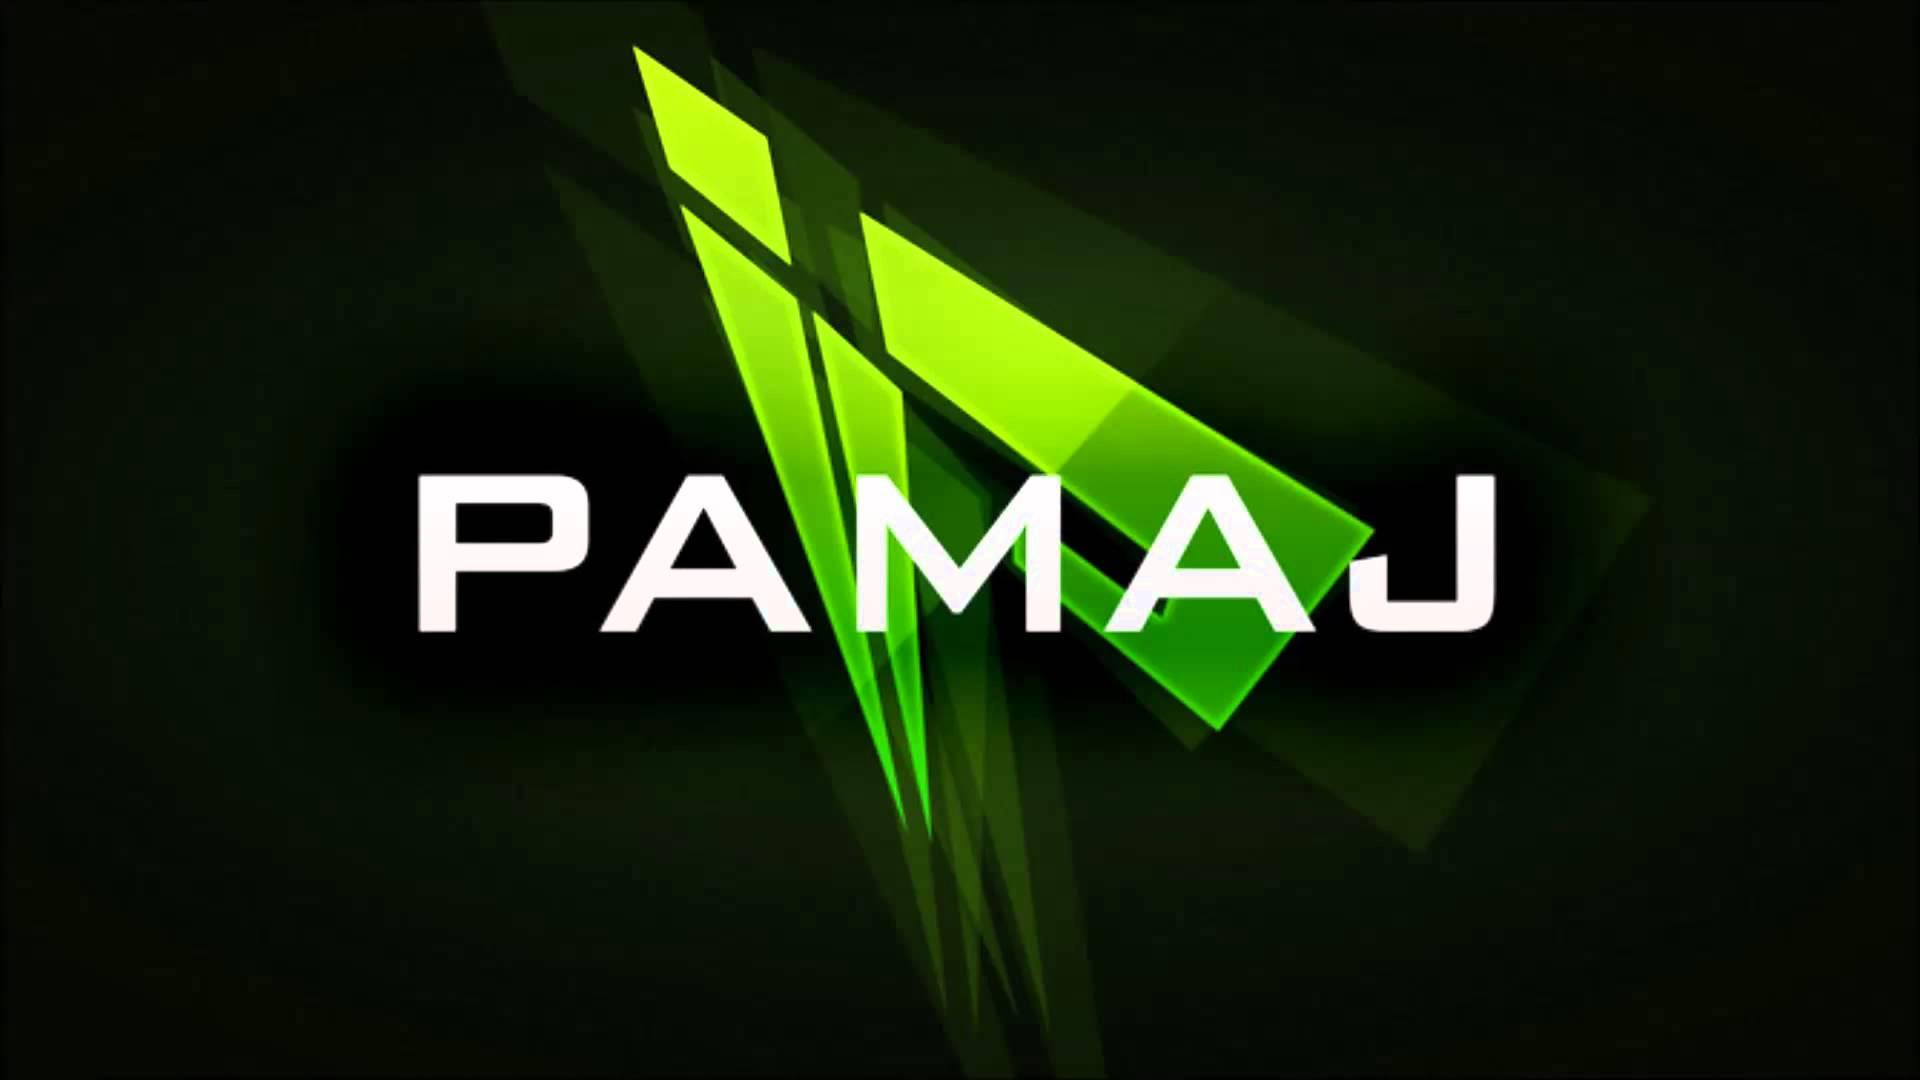 Hd Wallpapers Faze Pamaj Logo 320 X 180 15 Kb Jpeg HD Wallpapers 1920x1080